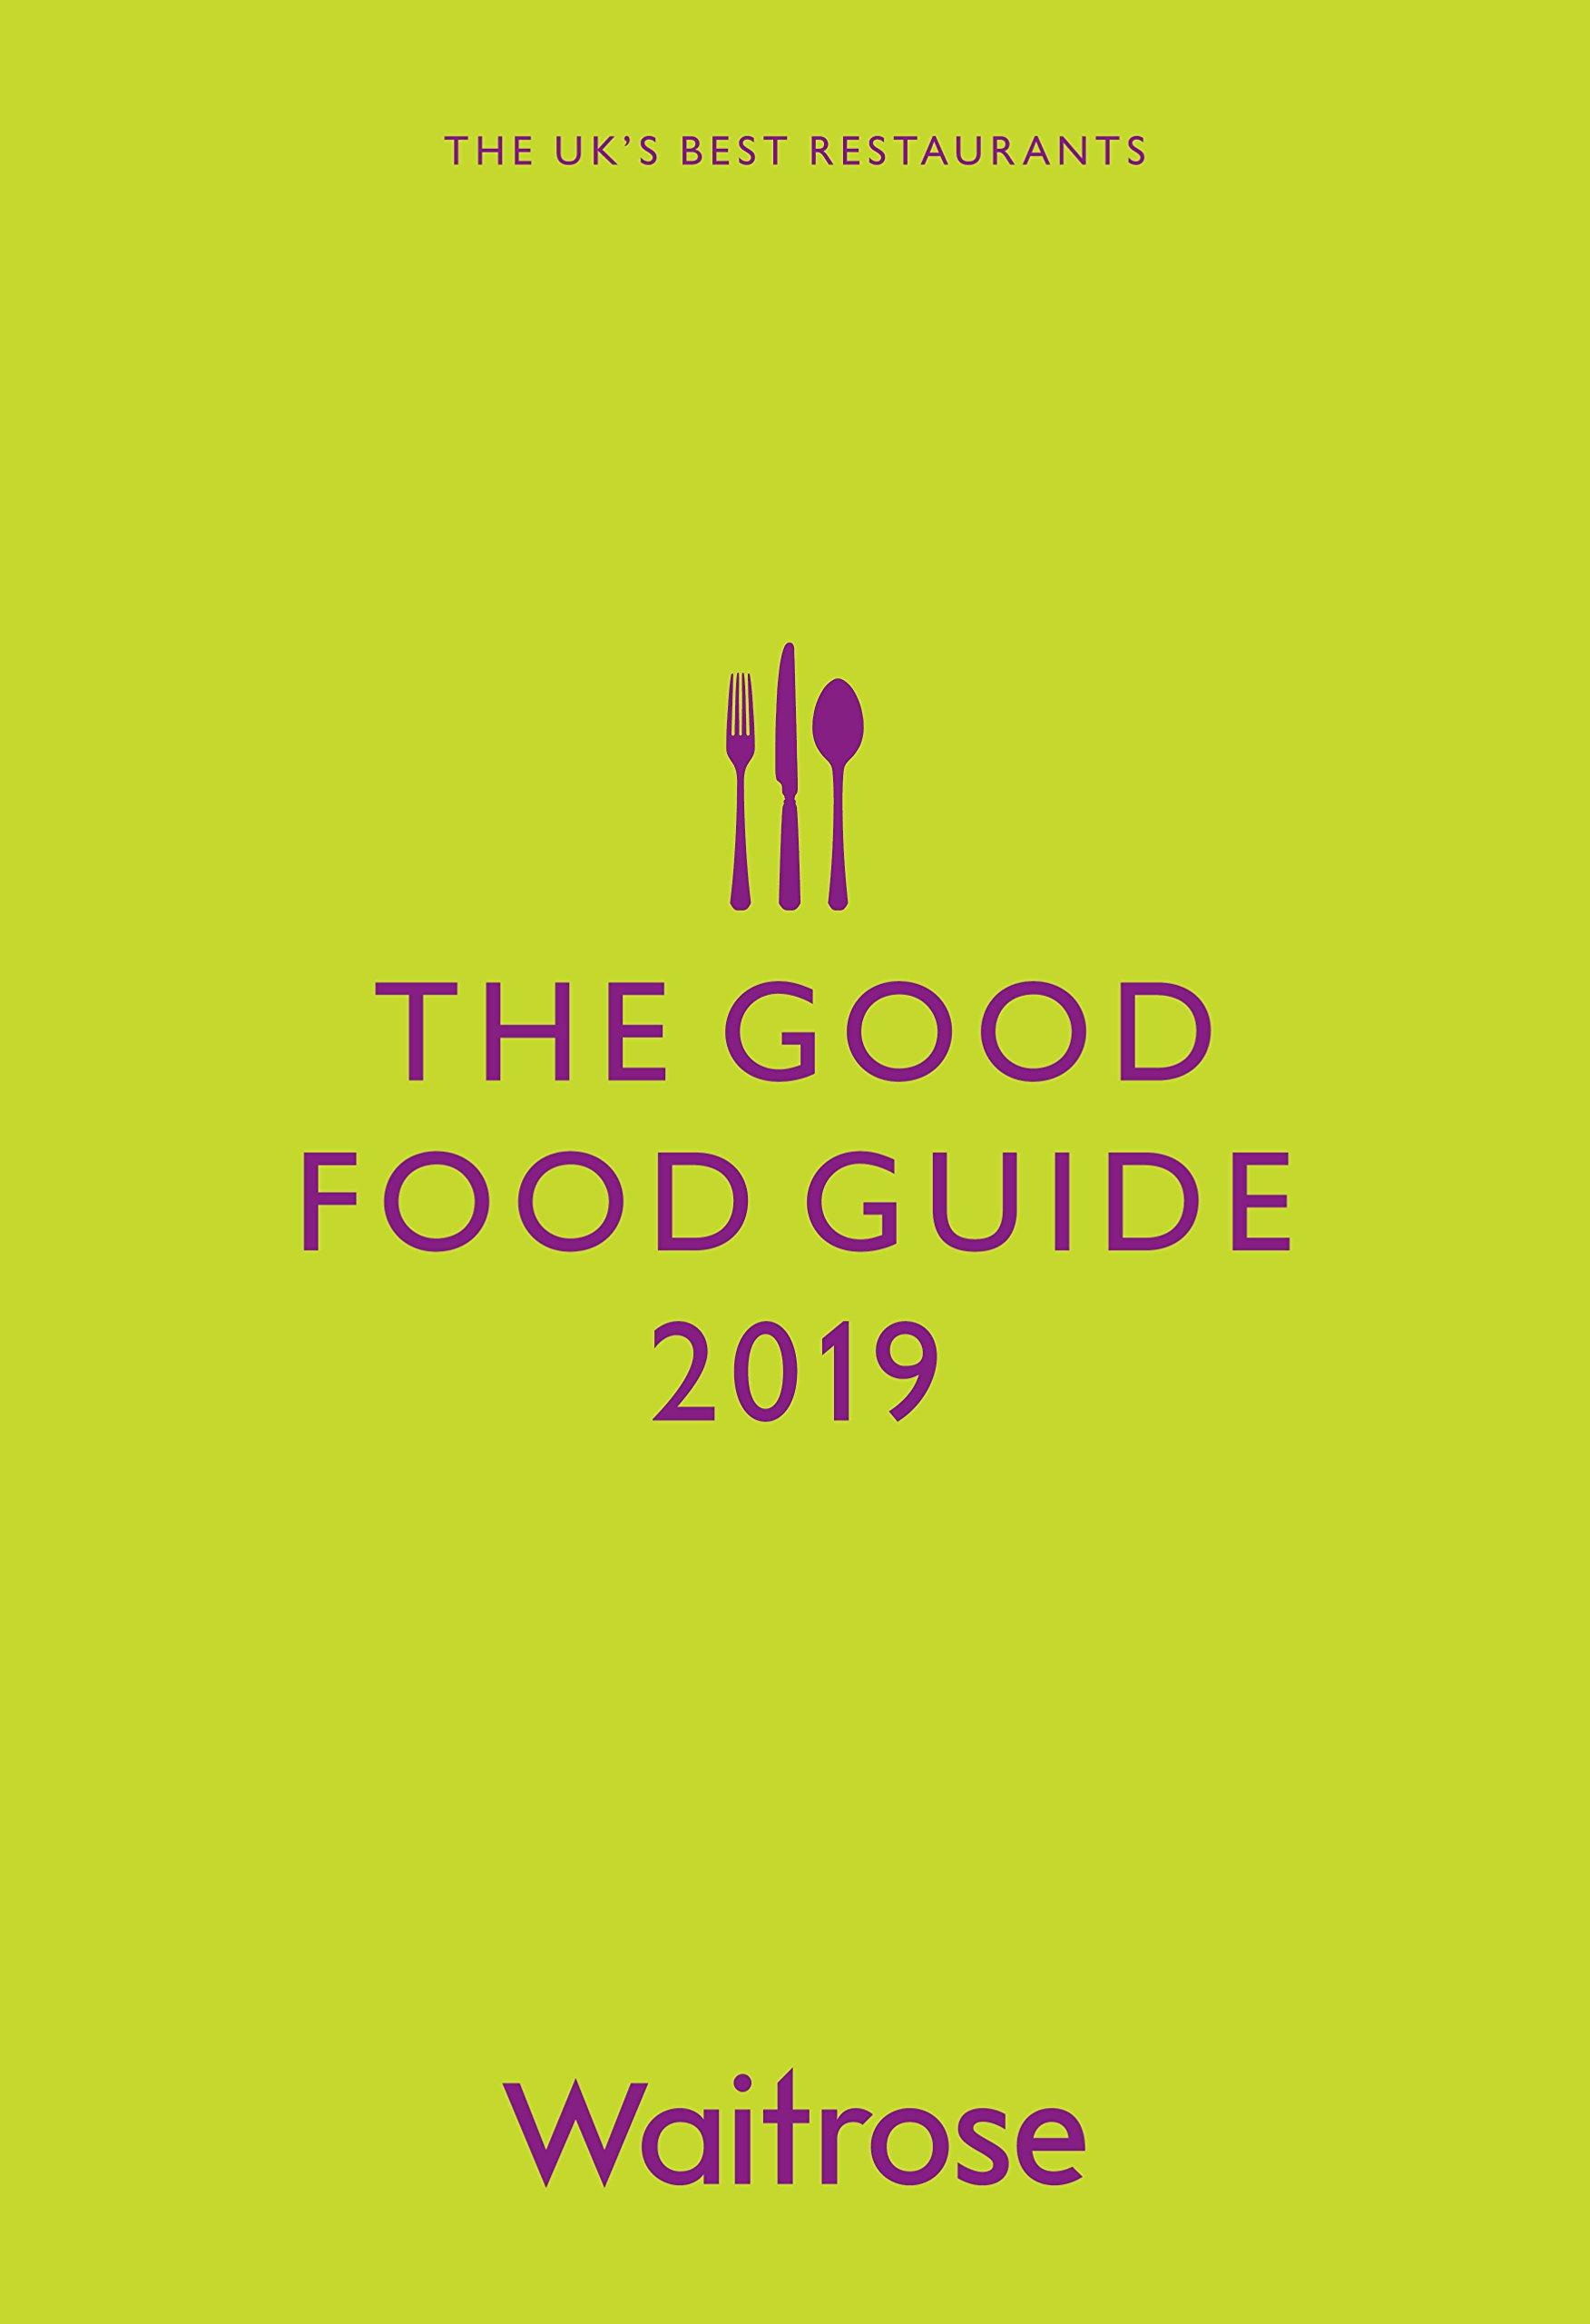 Risultati immagini per The Good Food Guide 2019 UK